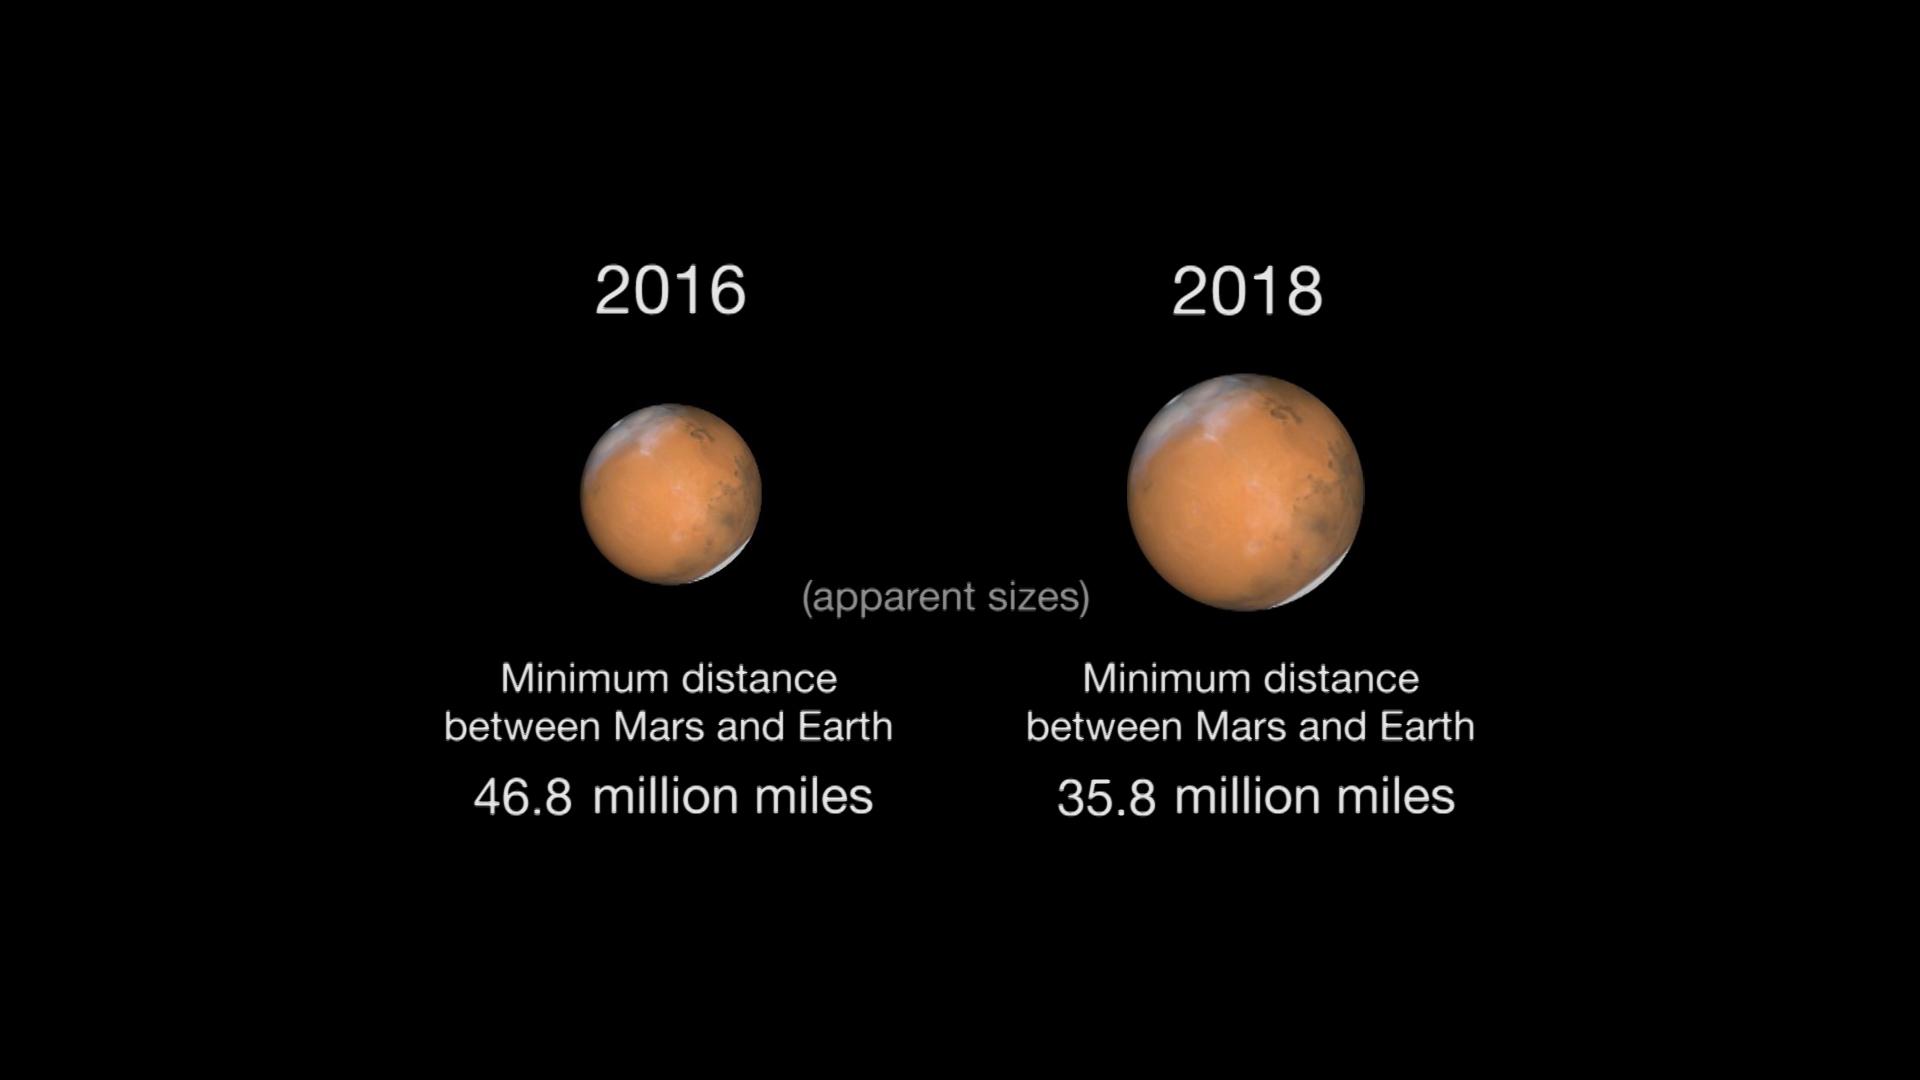 May Mars2016 2018 Jpg Nasa S Mars Exploration Program